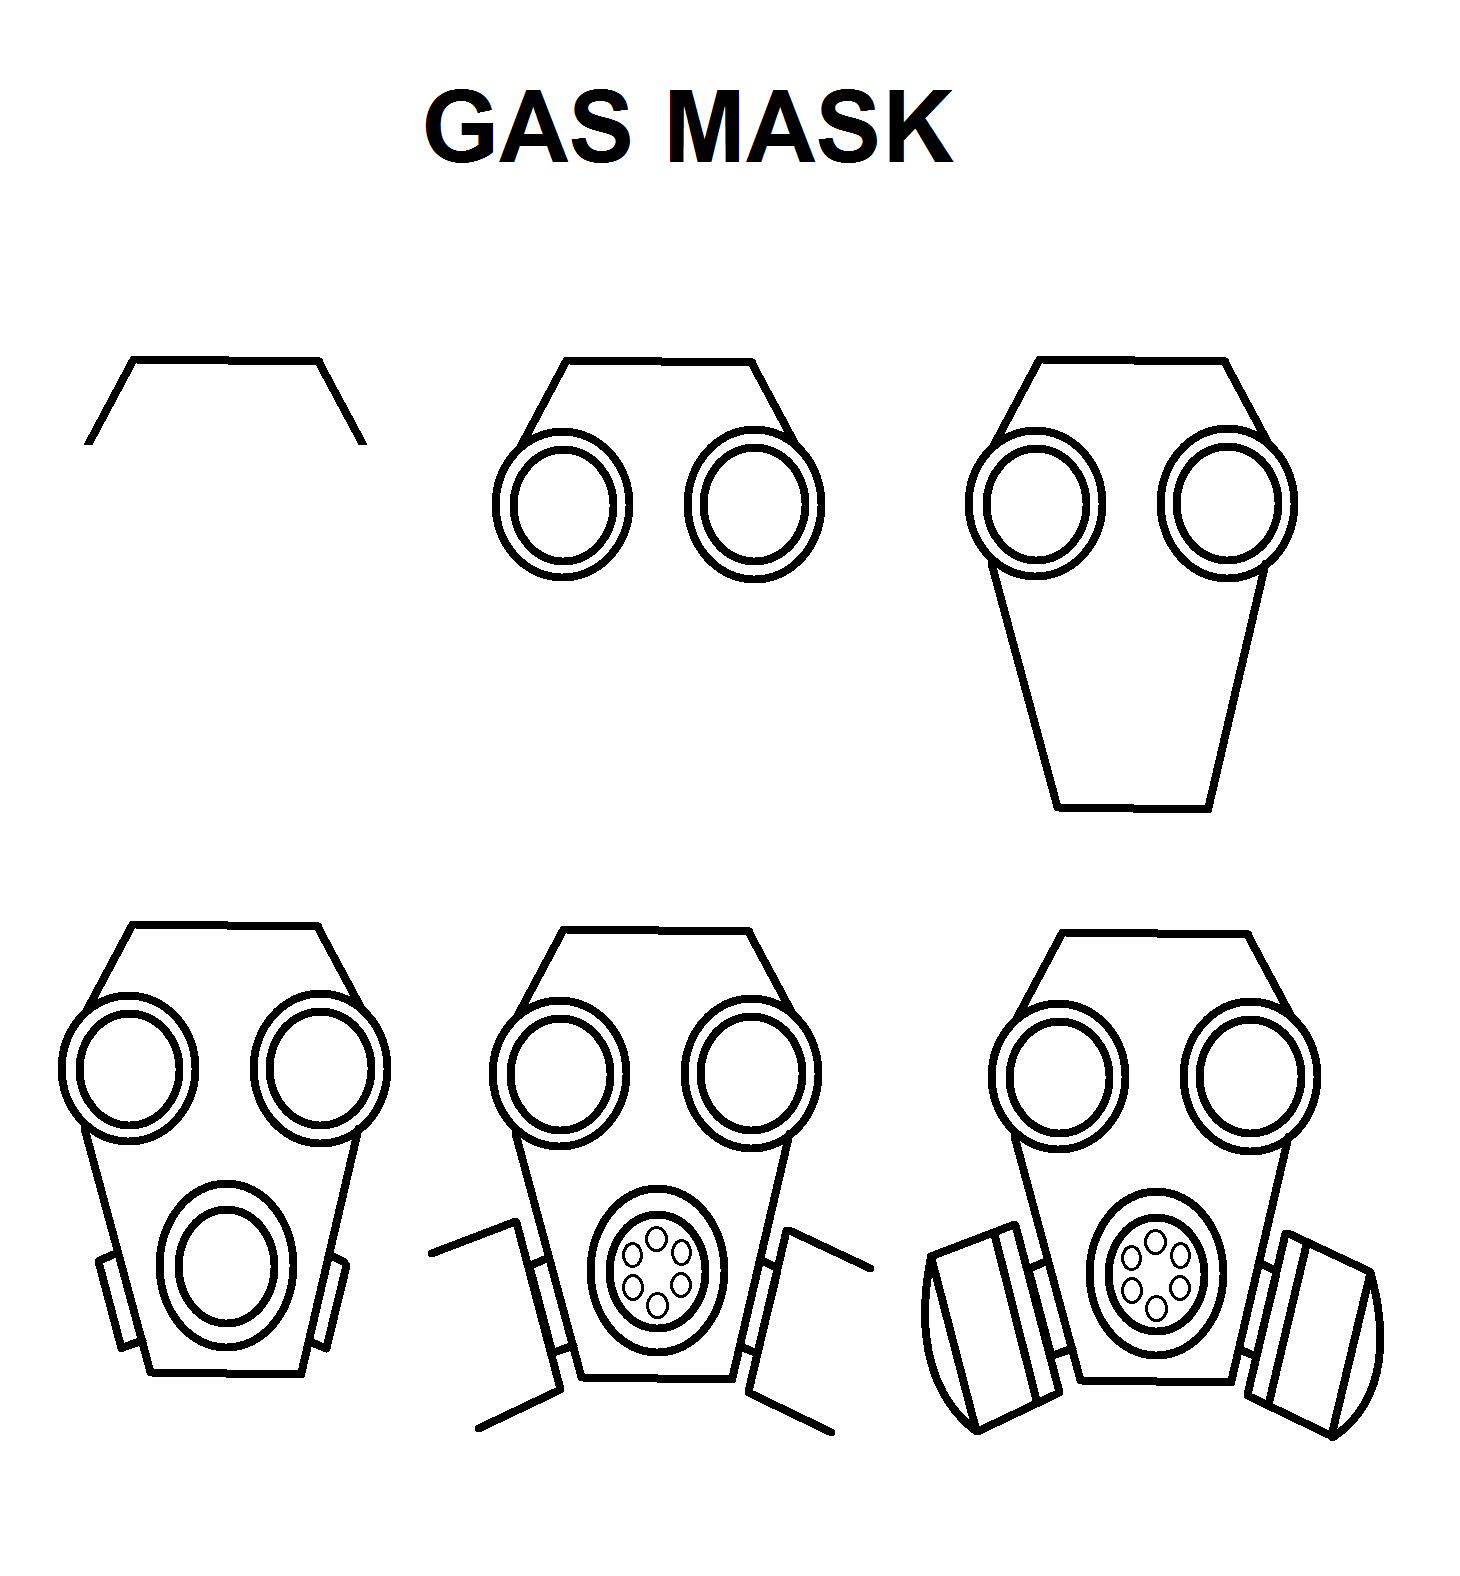 Gas Mask Gas Mask Drawing Gas Mask Gas Mask Art